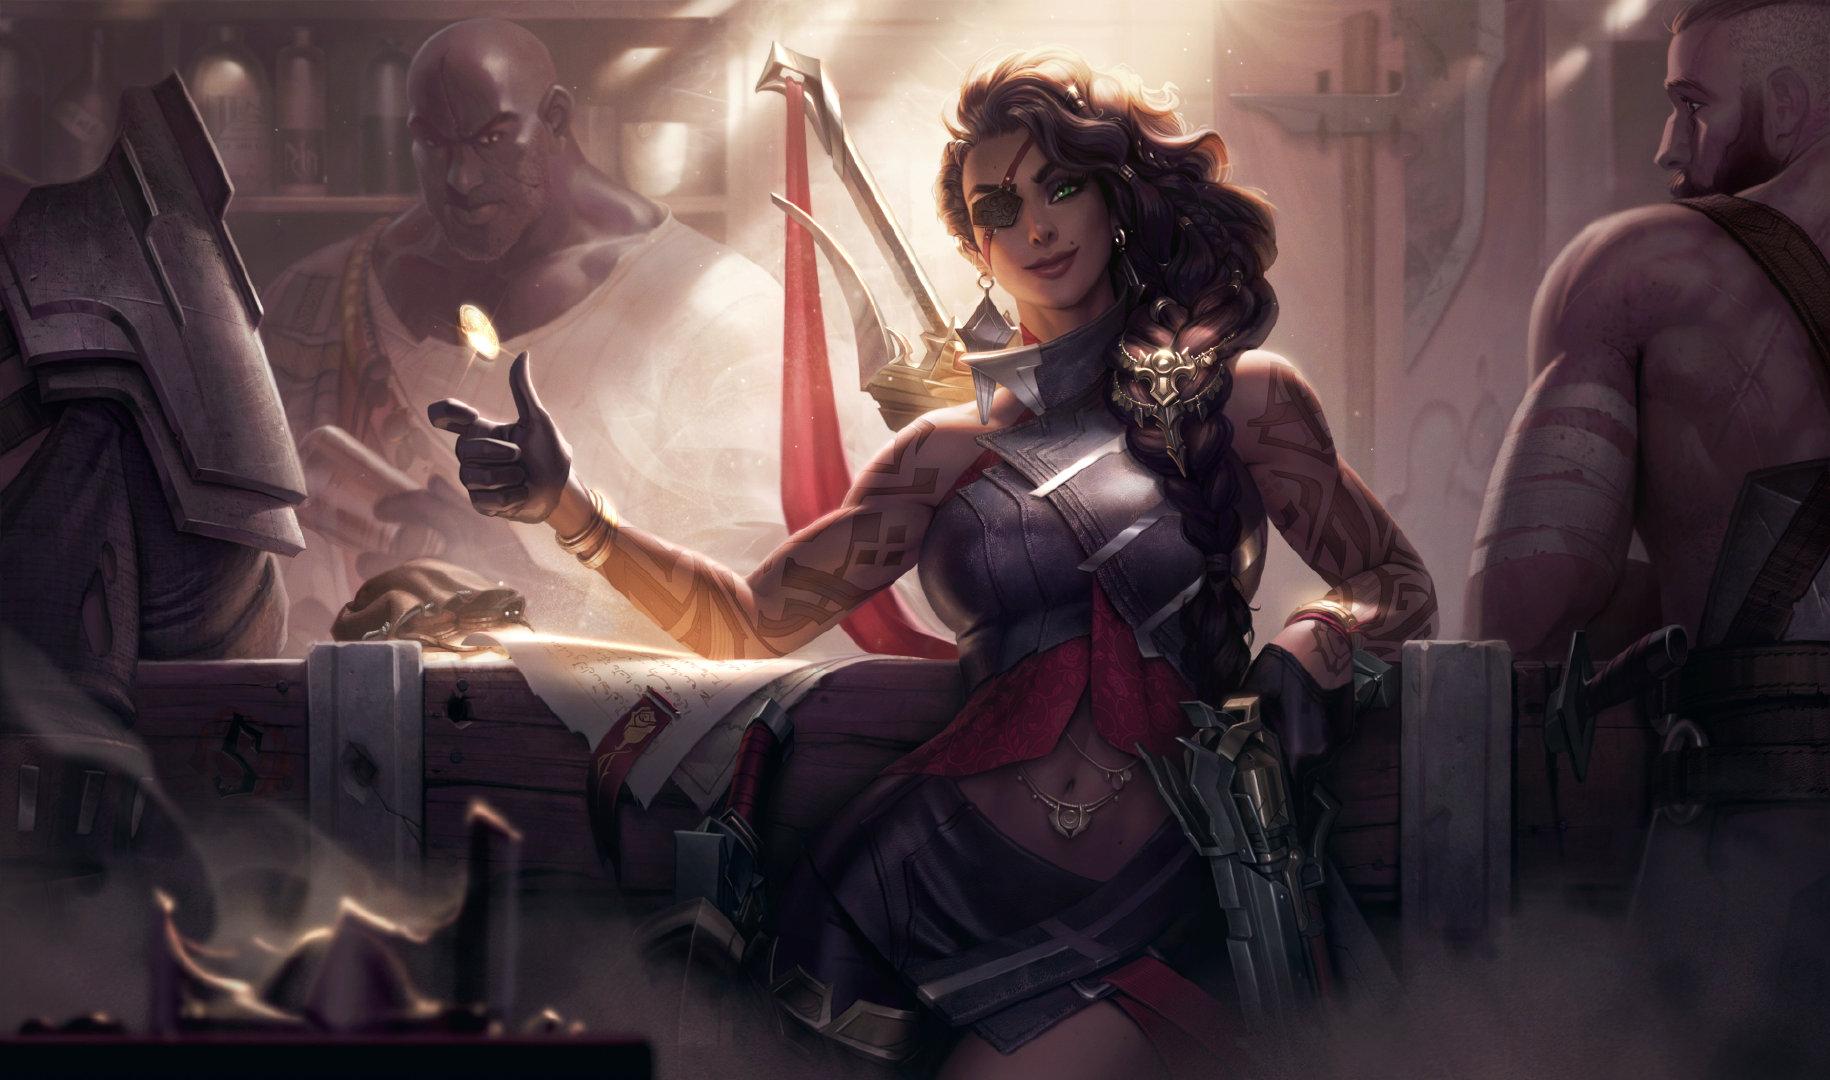 LOL:沙漠玫瑰莎弥拉玩法解析,残局收割能力堪比刺客